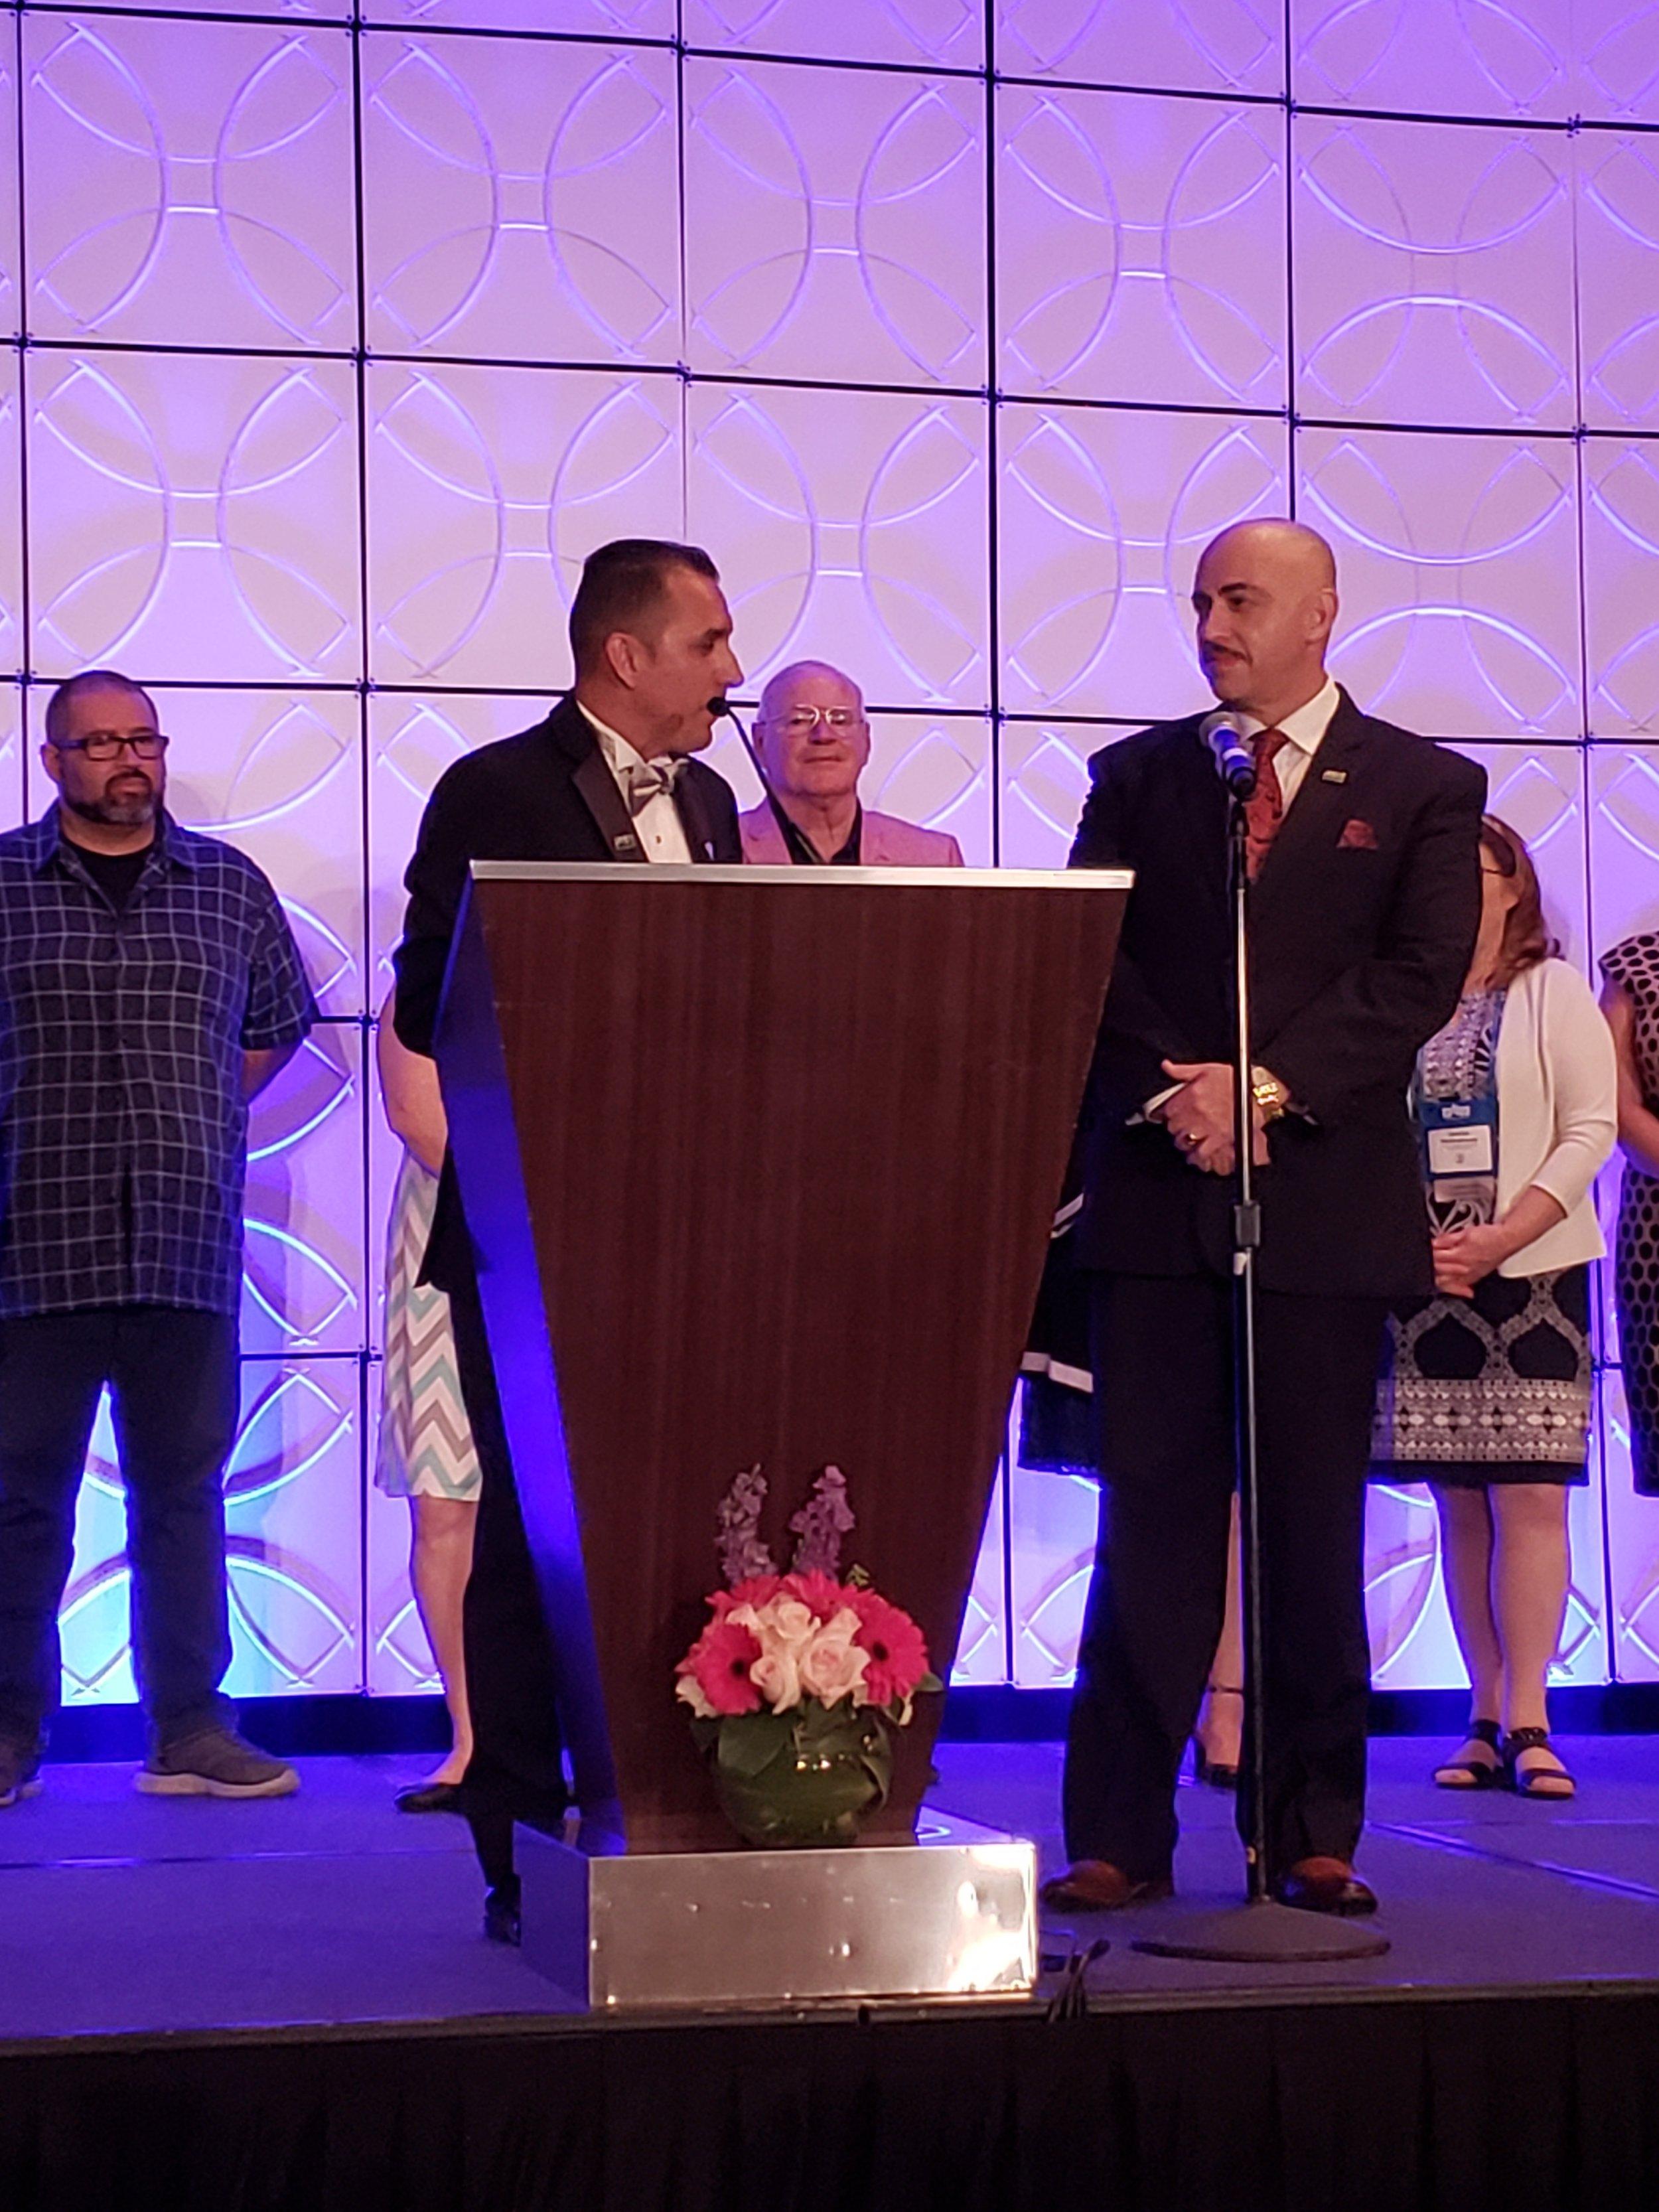 CCAE-State-Conference-San_Diego-2019-SC (8).jpg